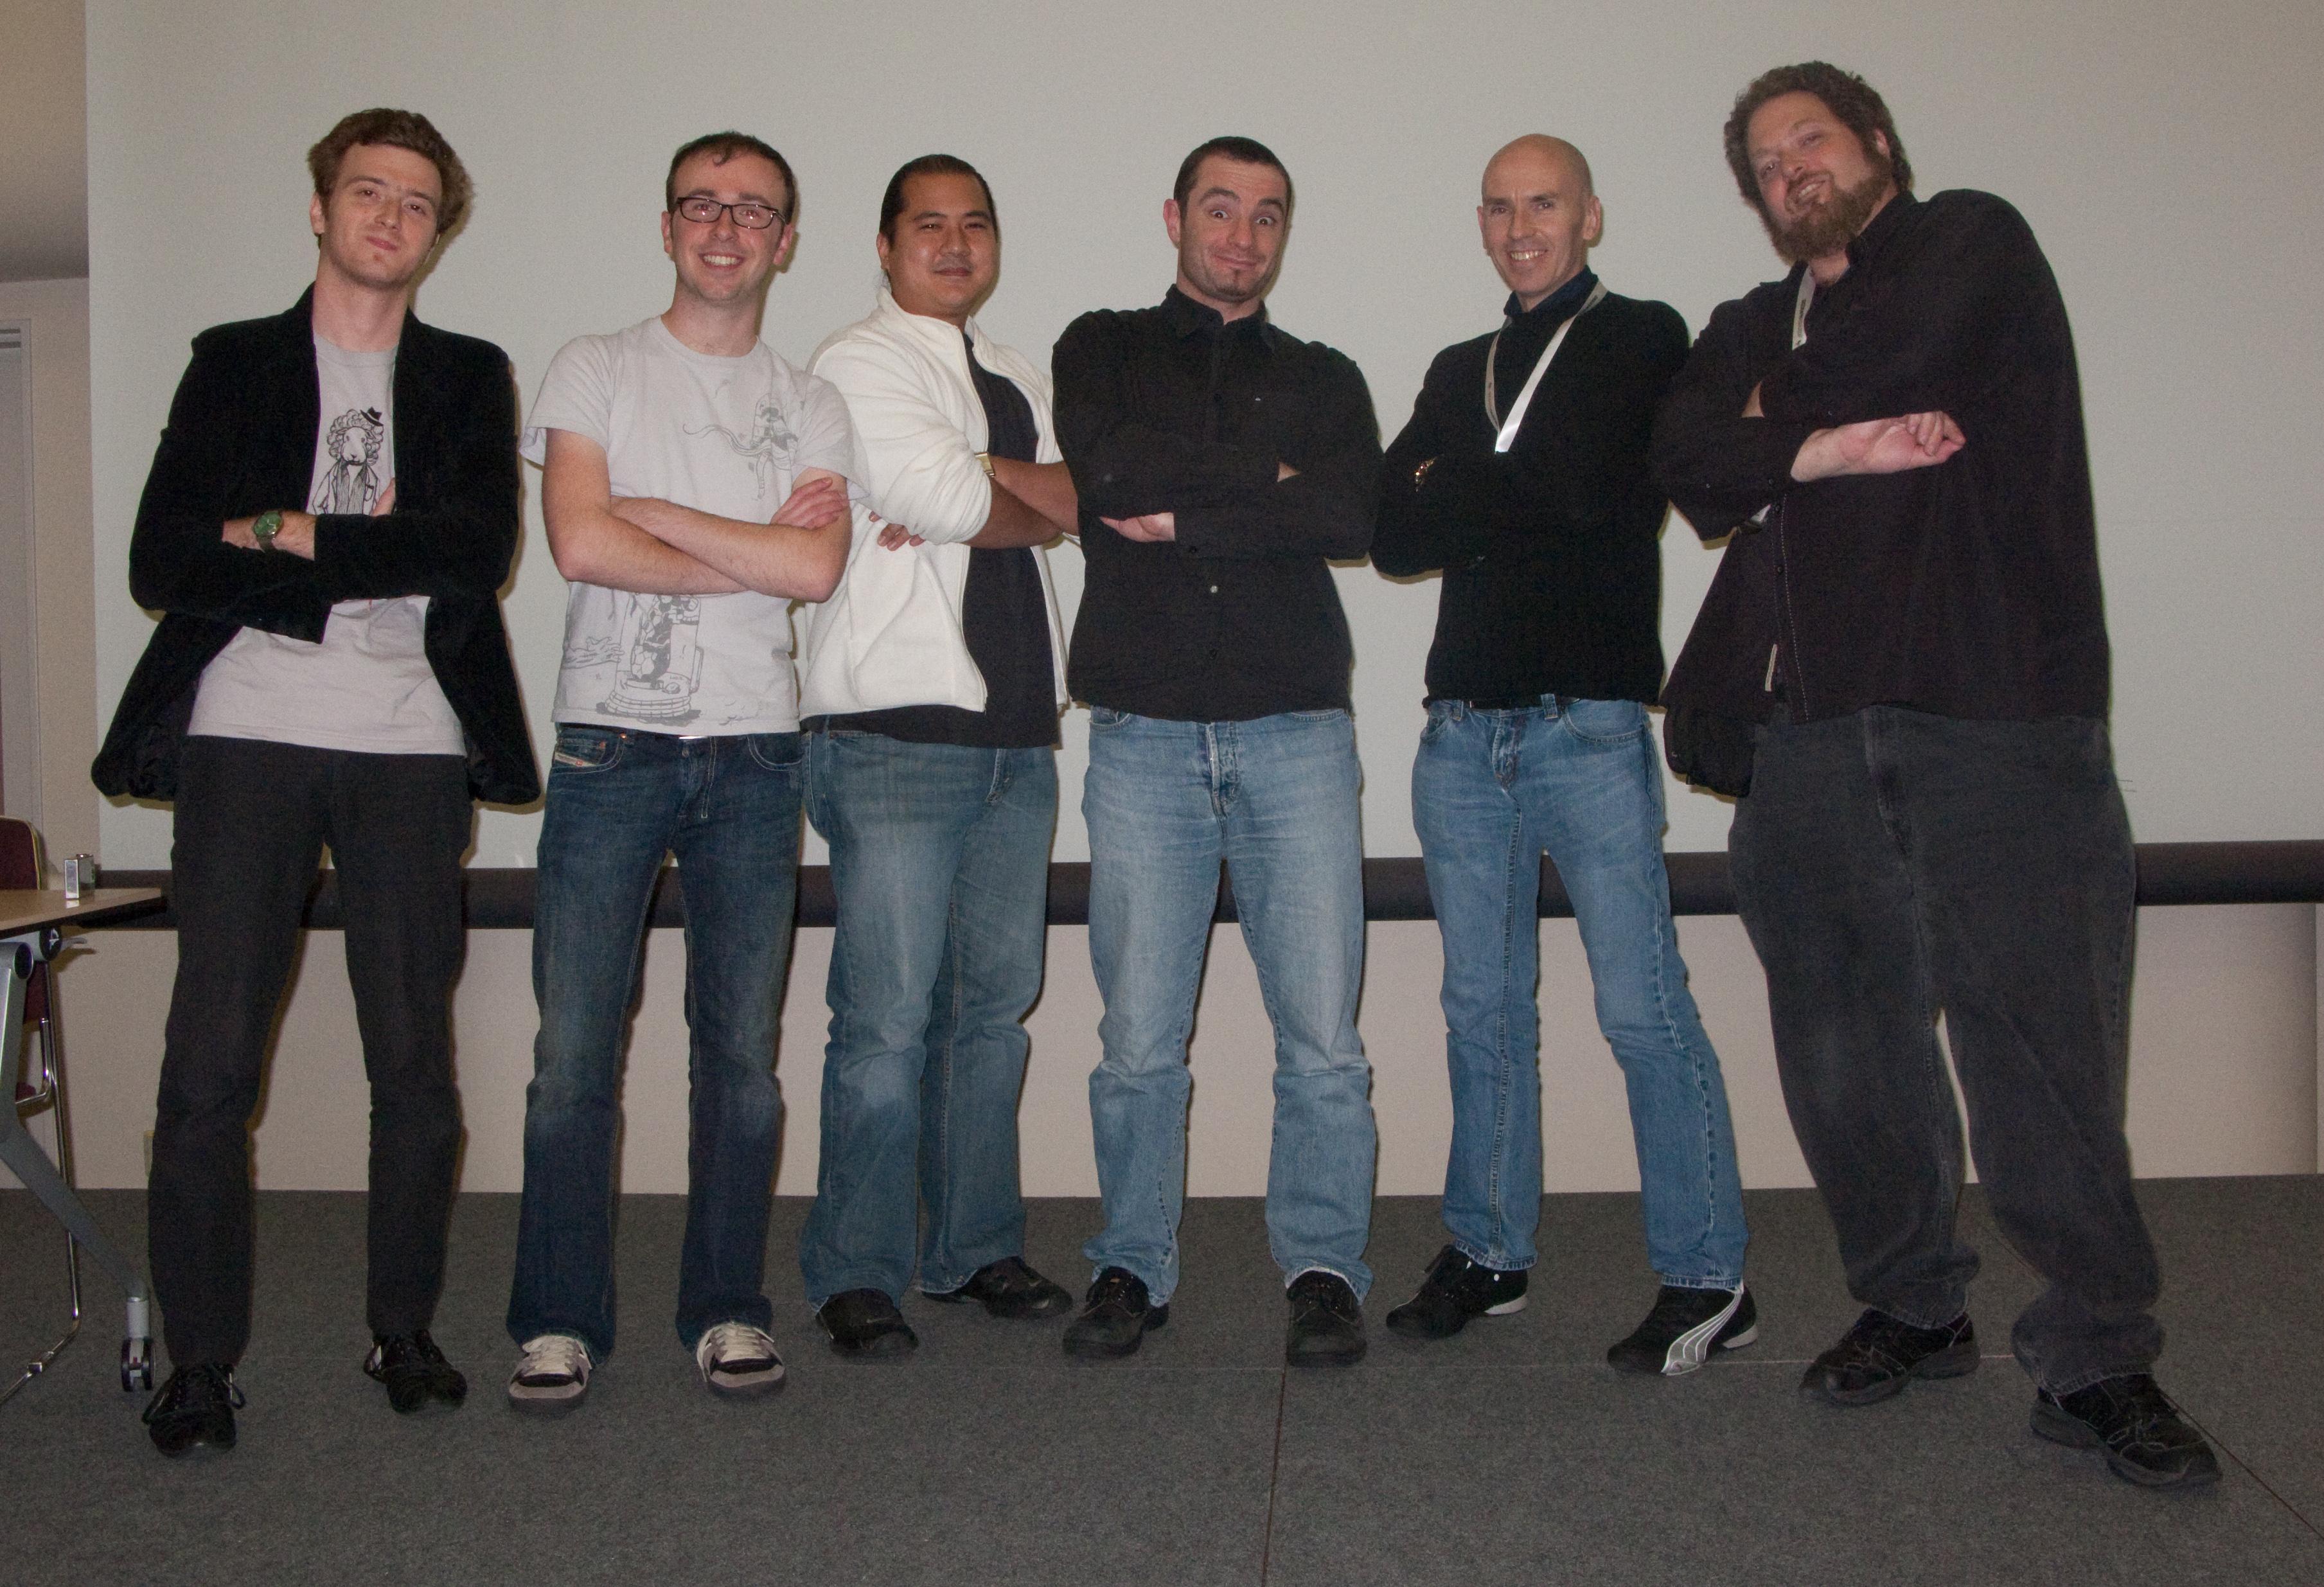 A Fuzz of Crowd Animators L to R: Mihai Cioroba, Paul Kanyuk, Tak Yoshida, Marc Salvati, Stephen Regelous, Xray Halperin